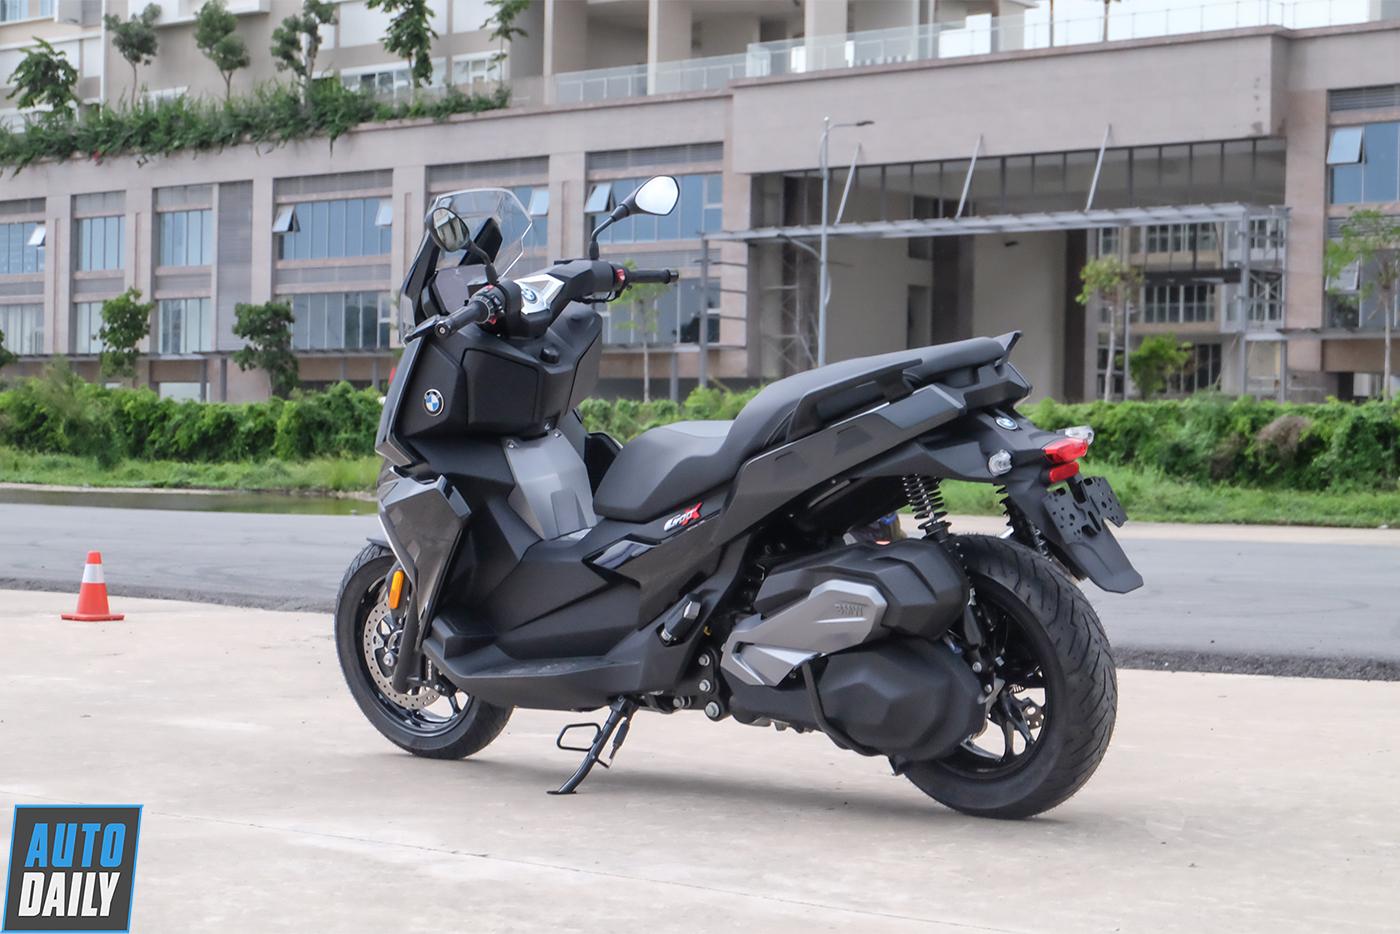 bmw-motorrad-c400x-3.jpg